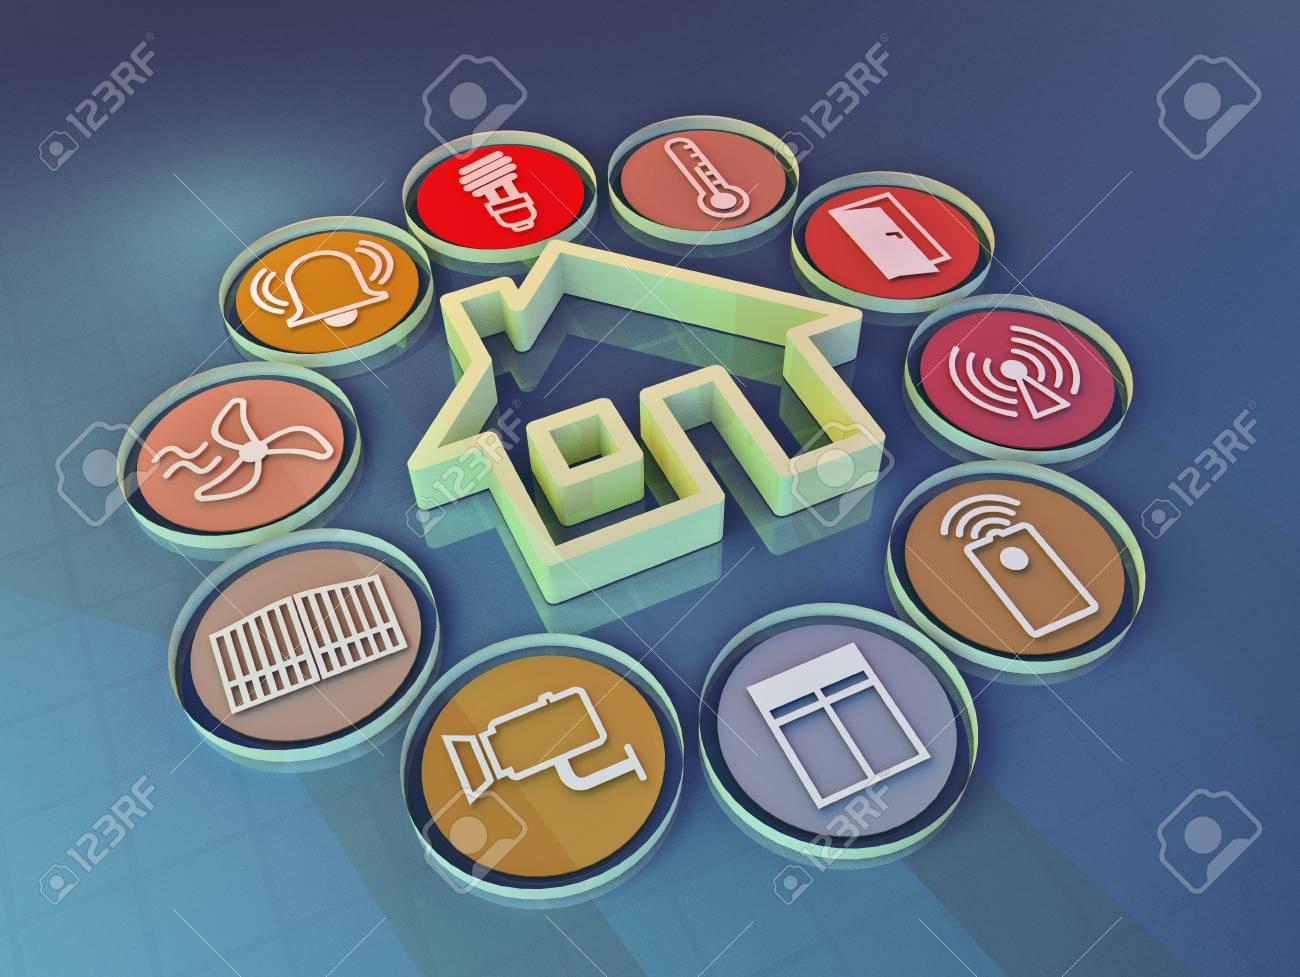 3d render illustration of icons symbolizing the smart home - 53651911